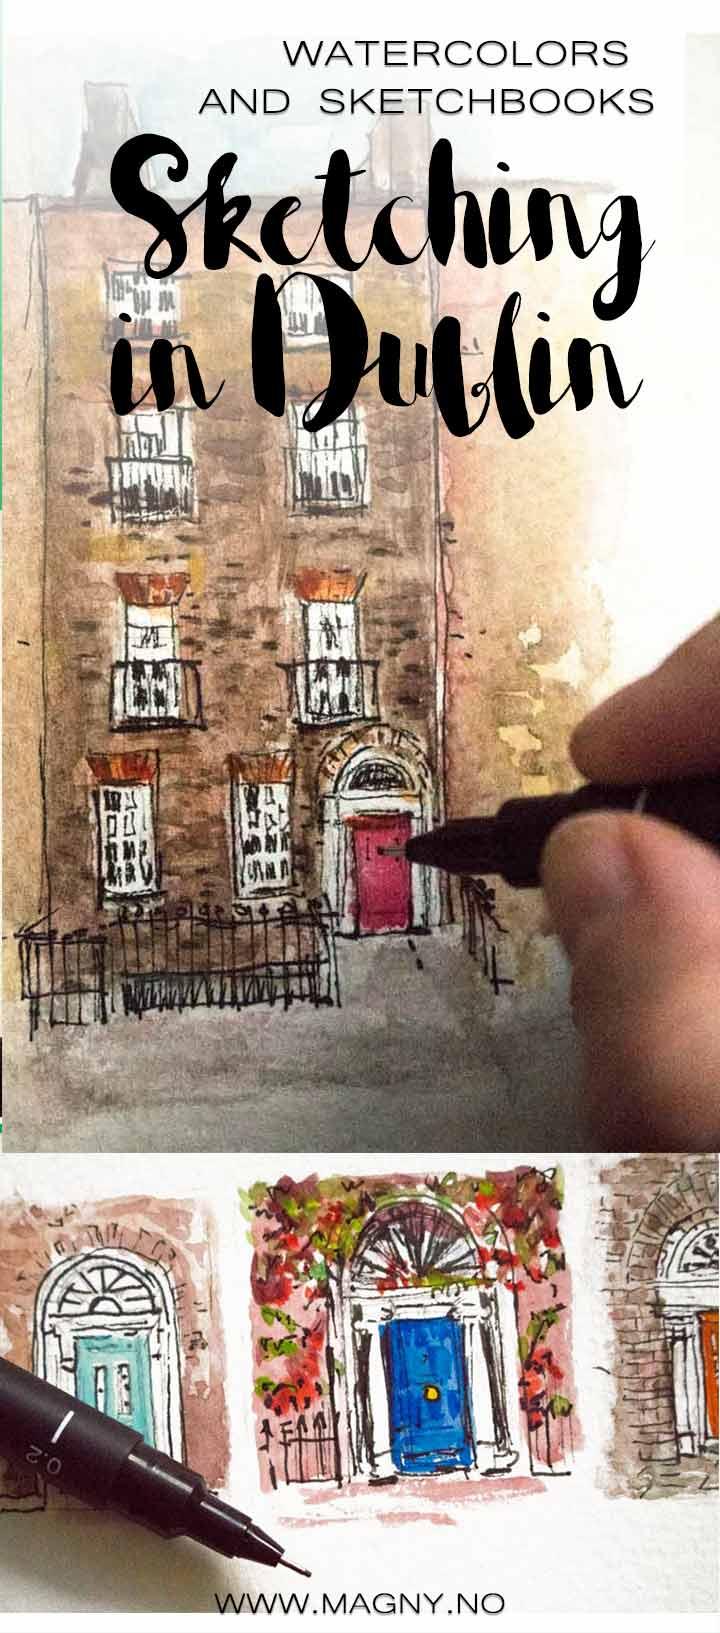 Irland travel, Travel sketchbook journal